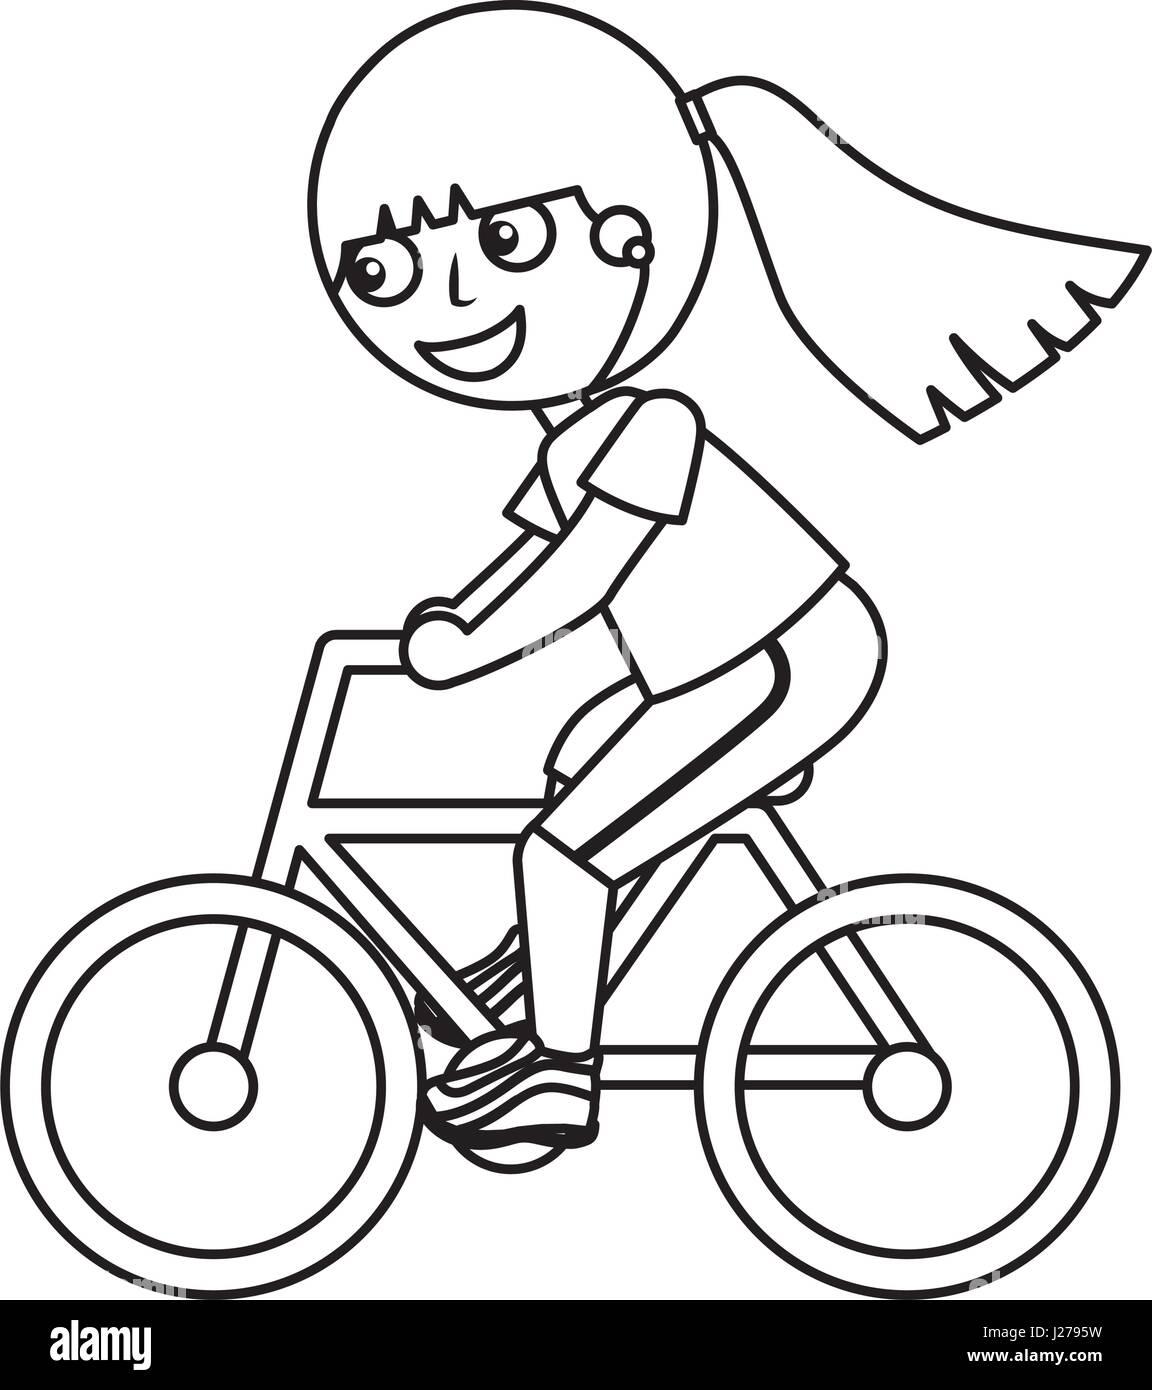 Niña montando bicicleta Ilustración del Vector, Imagen ... Andar En Bicicleta Para Colorear